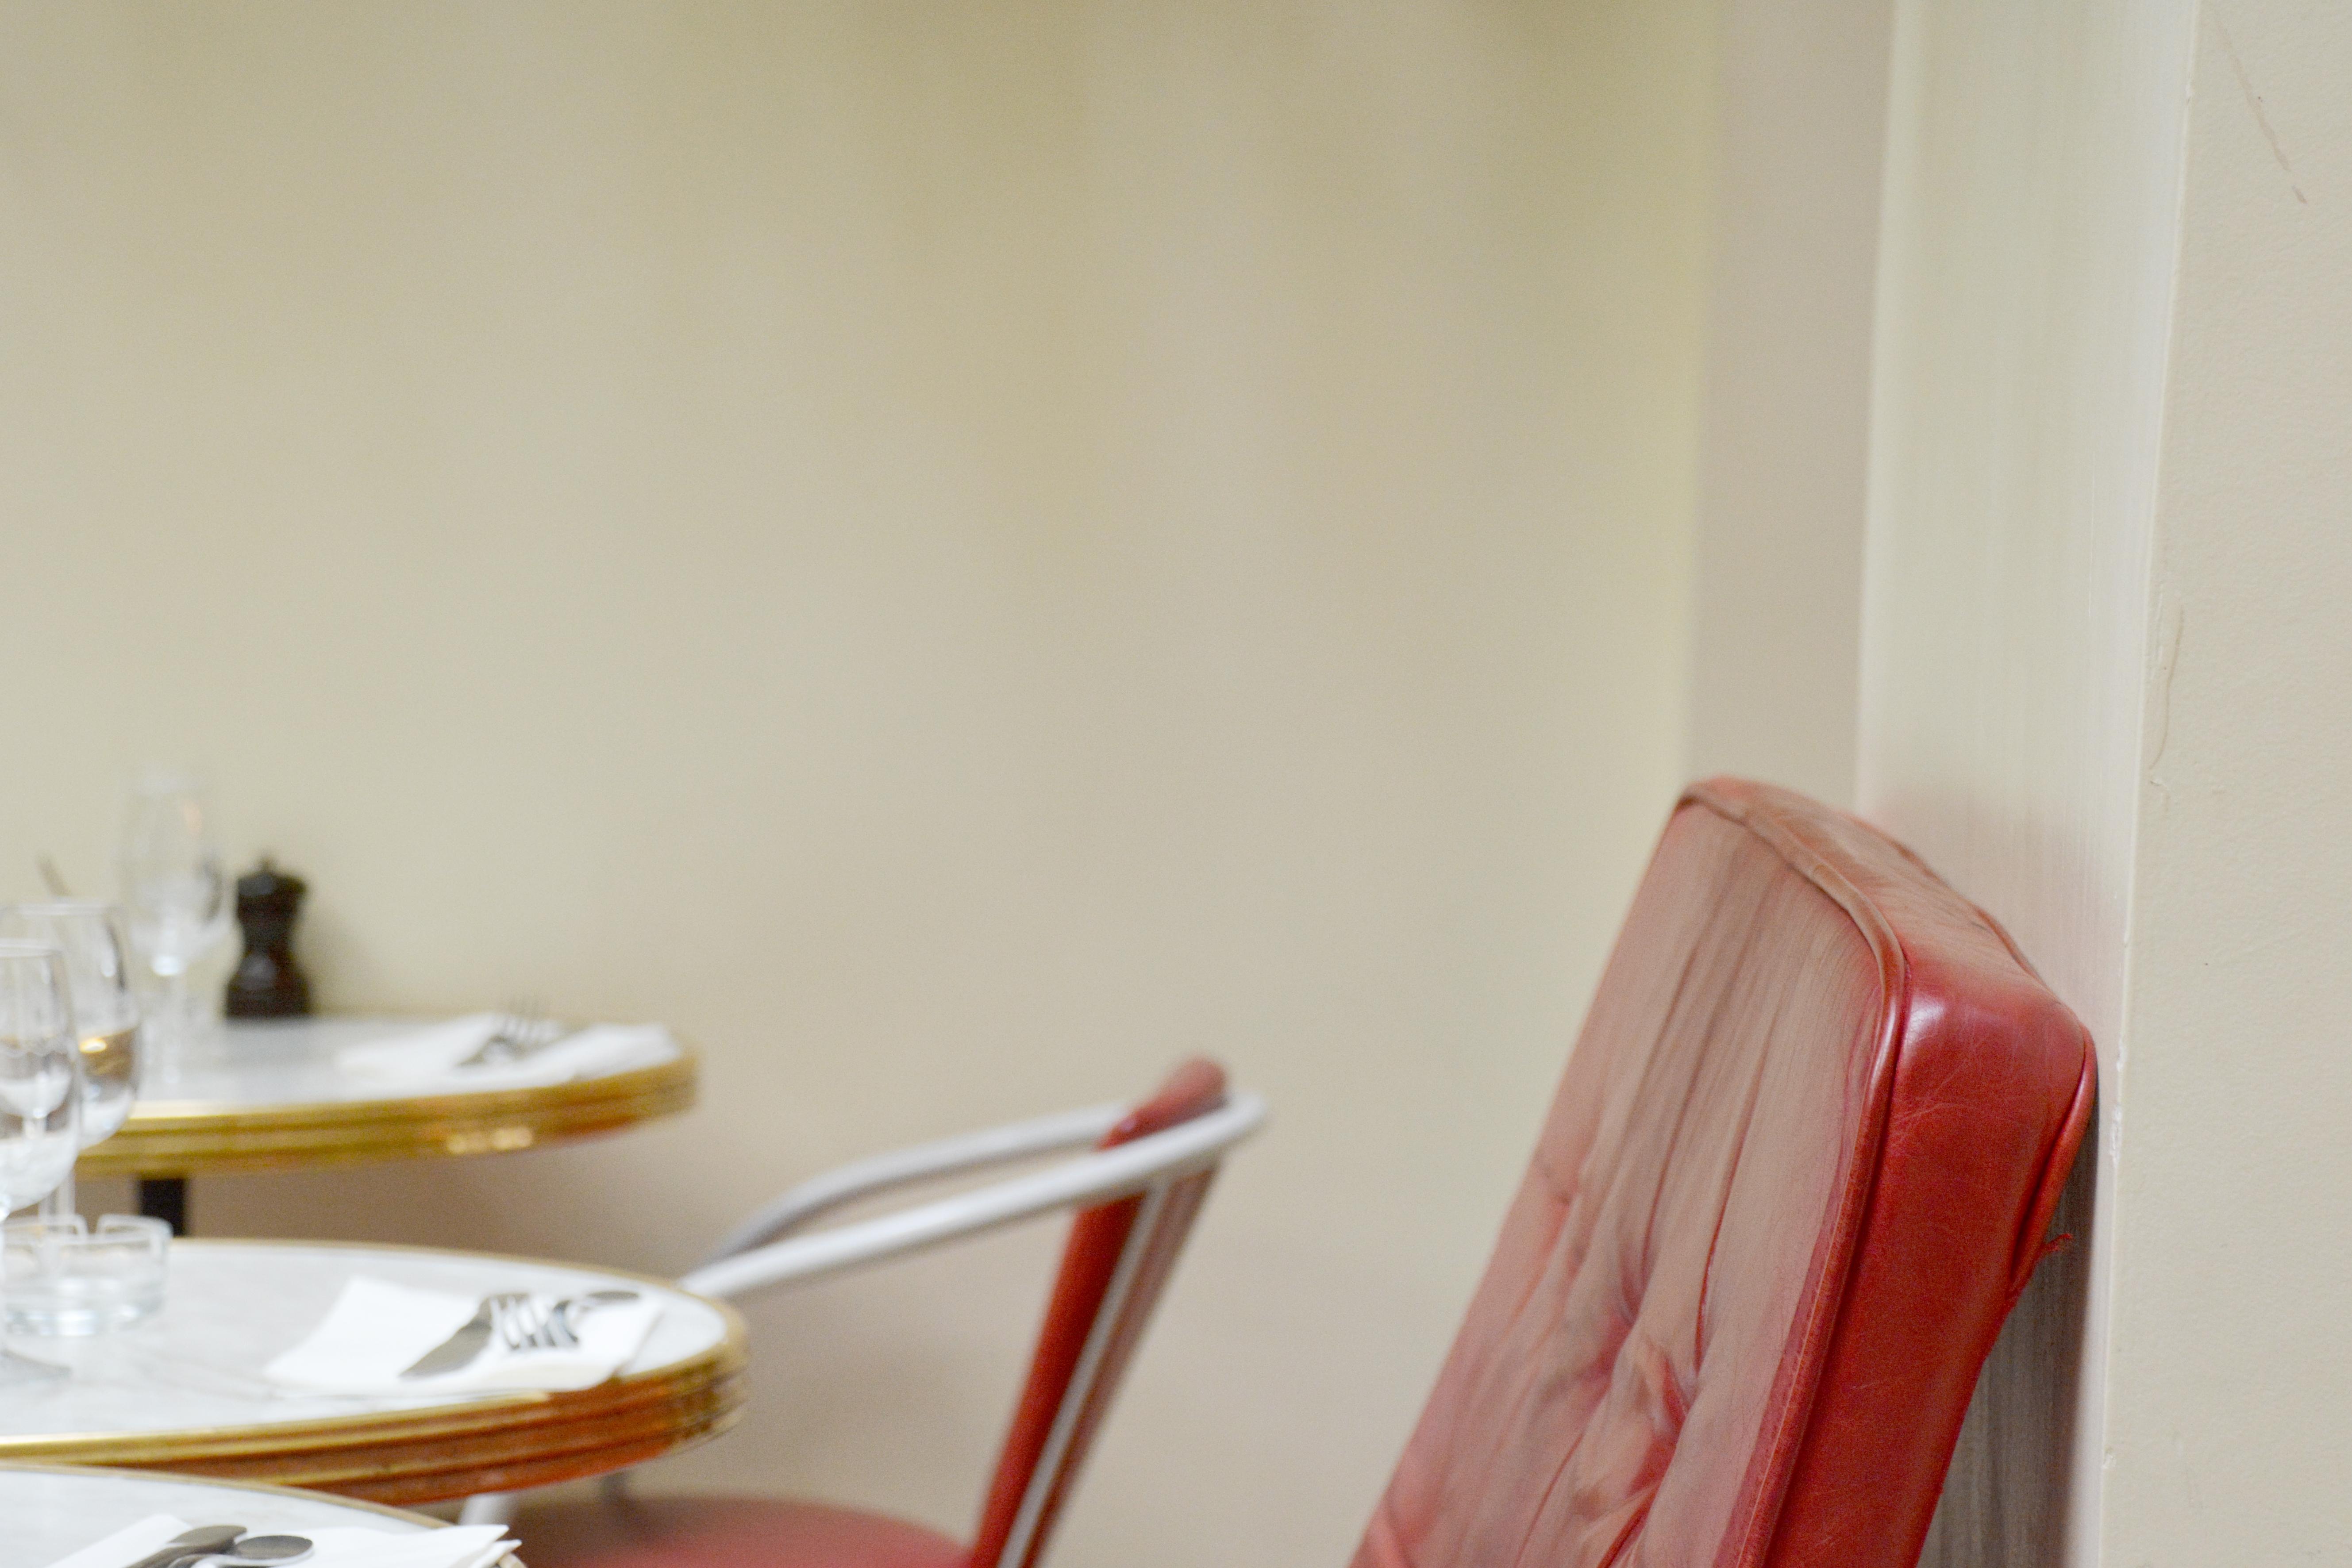 hotel amour un restaurant patio luxuriant le poly dre. Black Bedroom Furniture Sets. Home Design Ideas